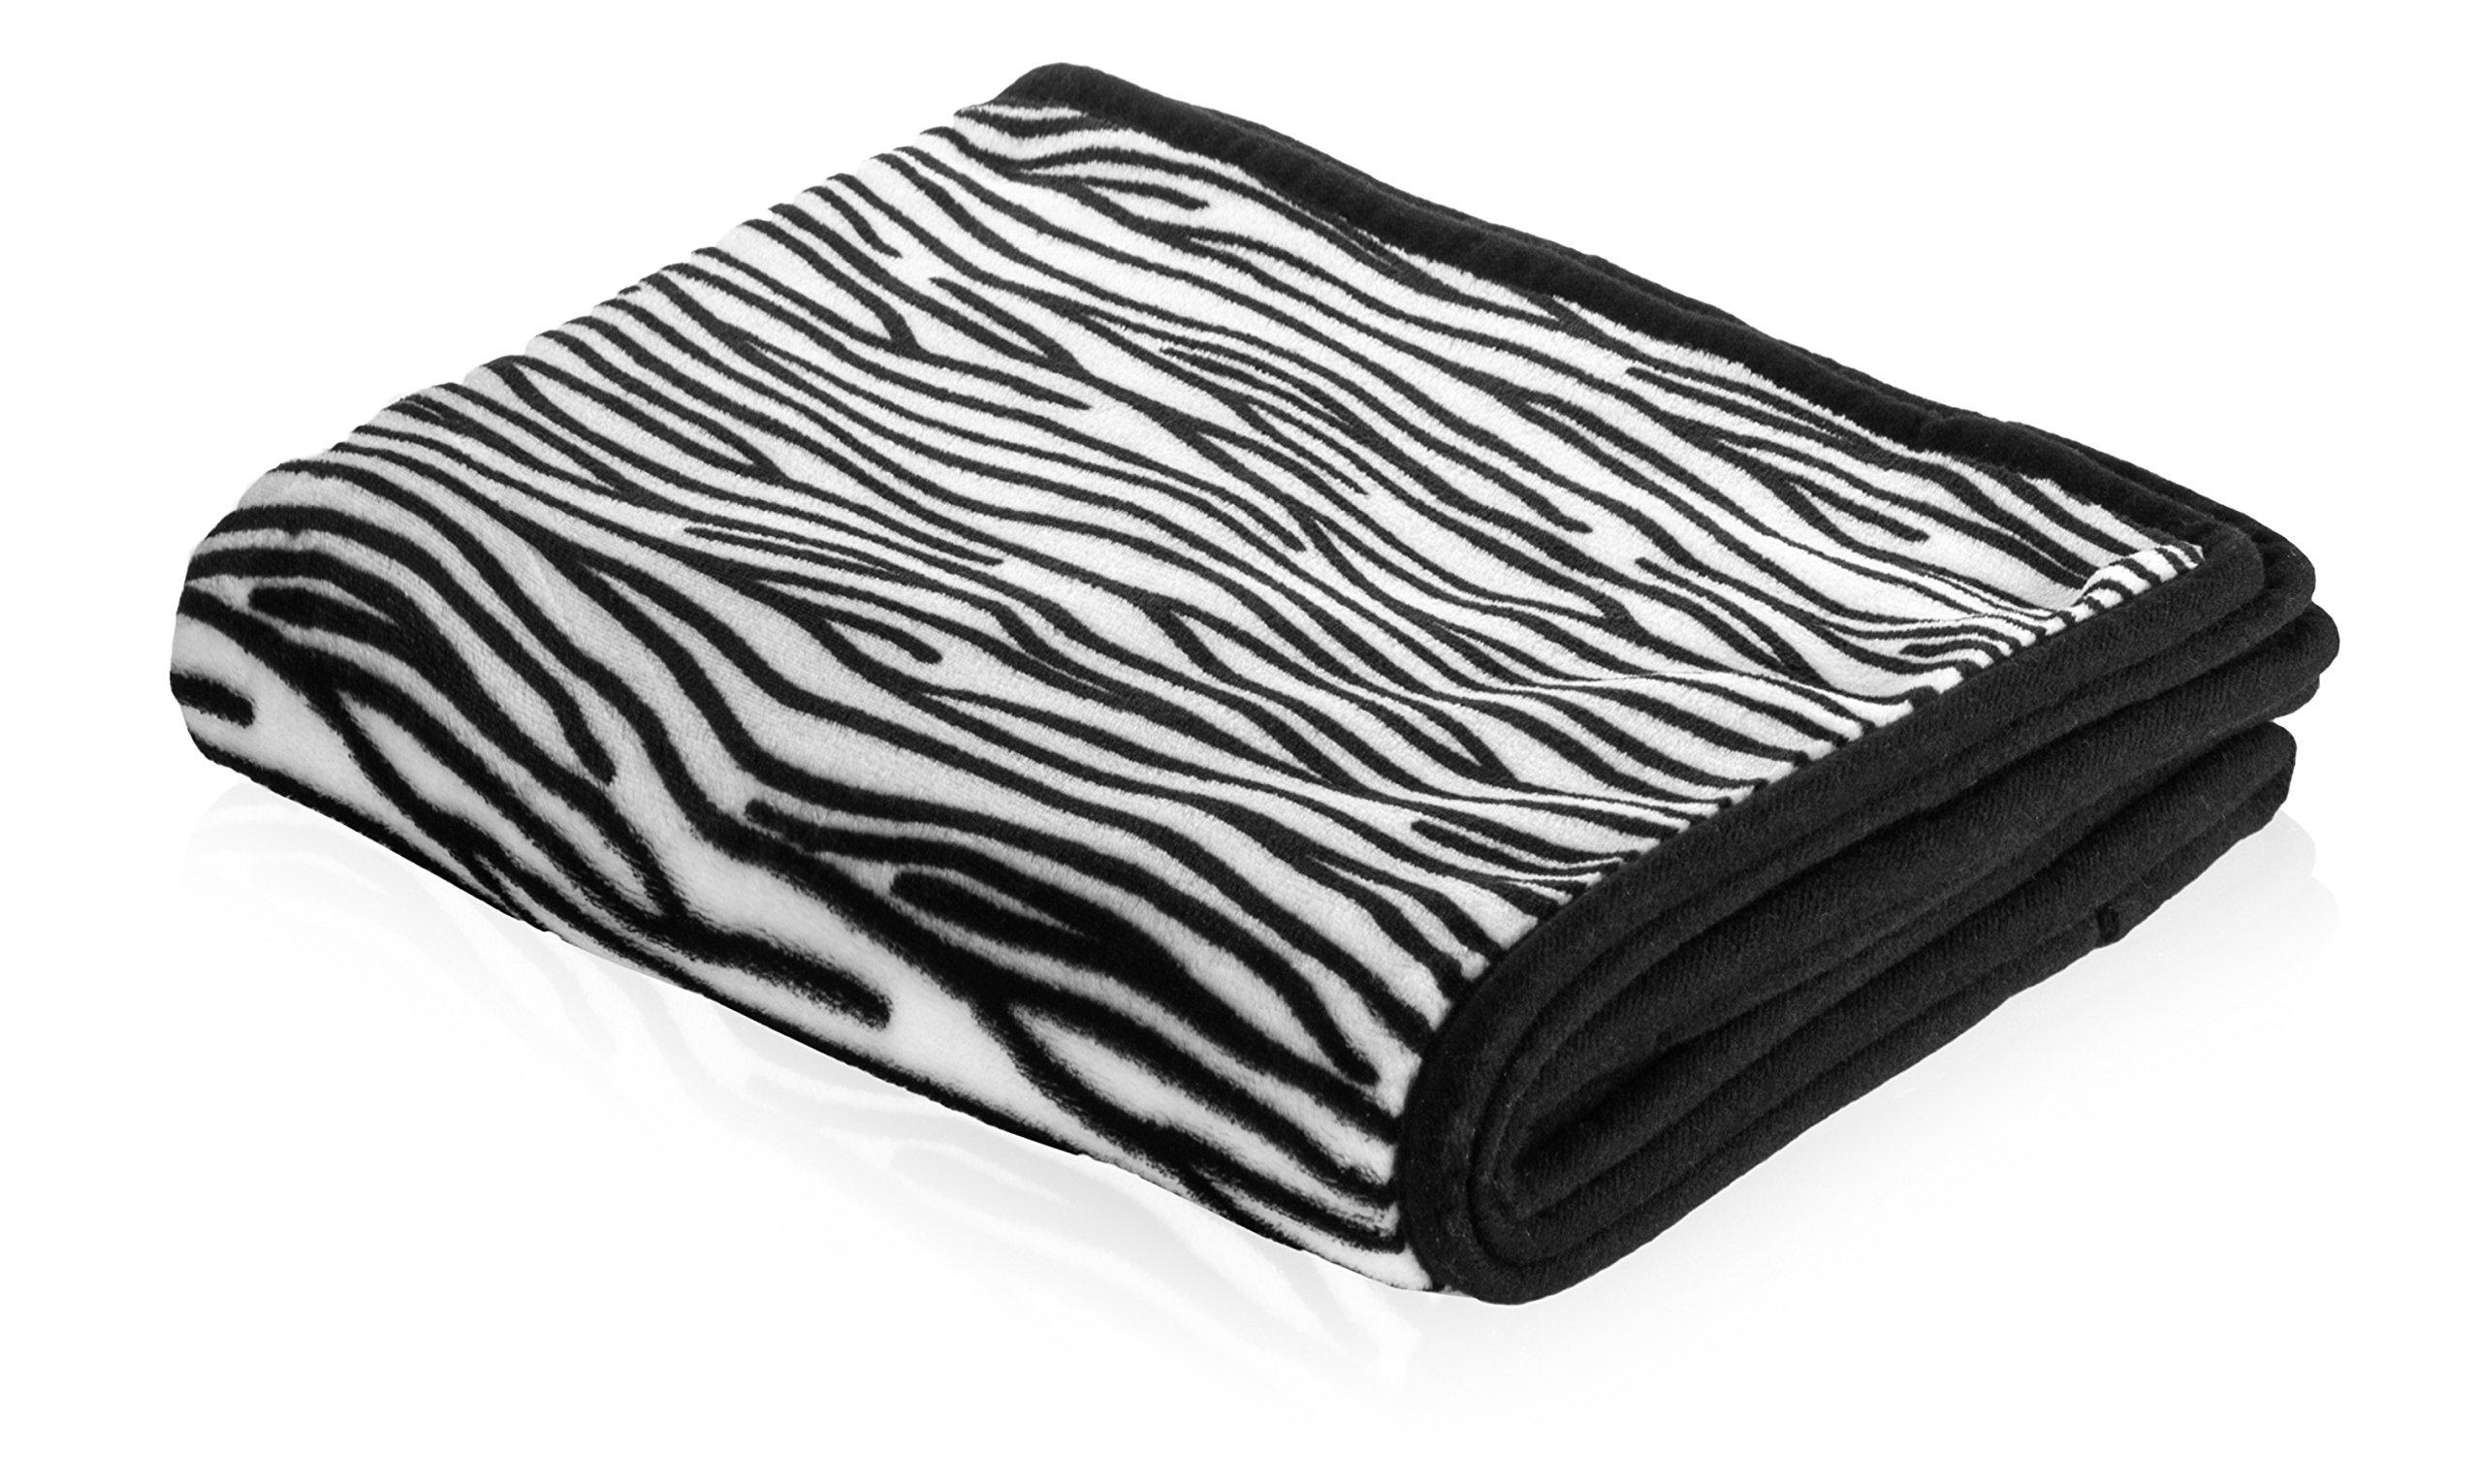 Smart Pet Love Snuggle Blanket for Pets, 48'' x 30'', Zebra